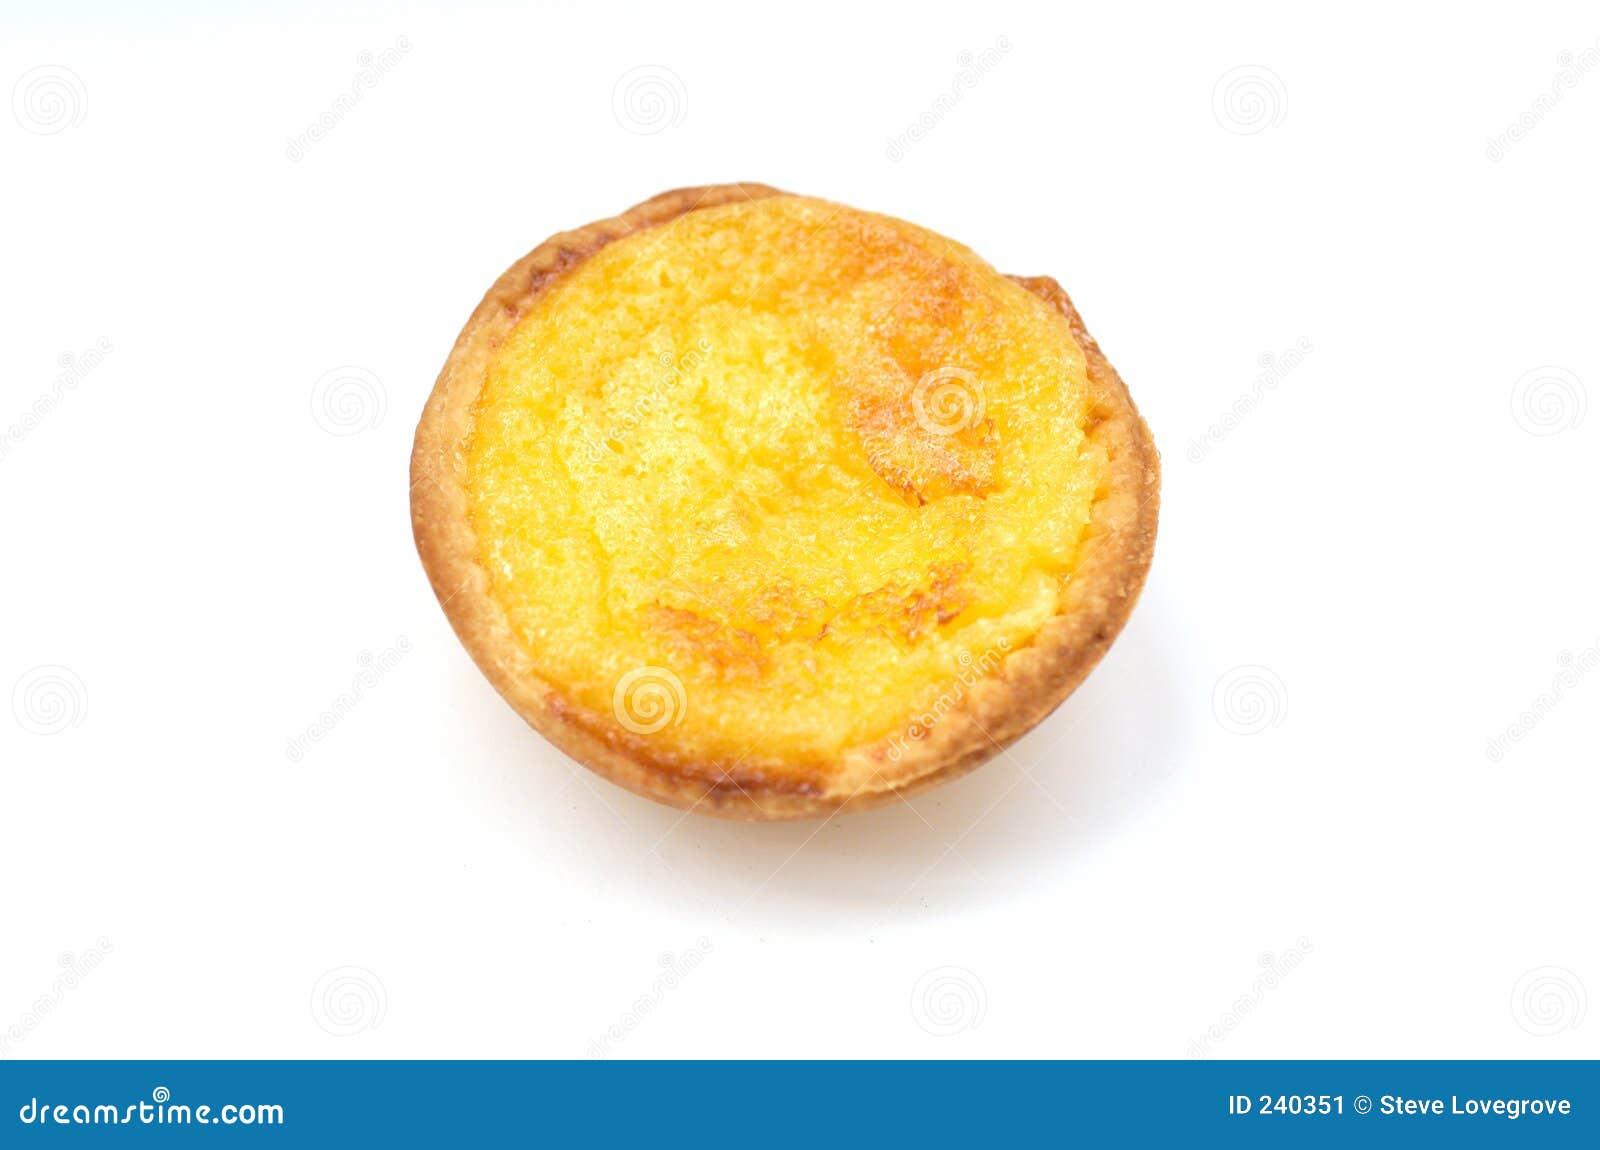 Torta portoghese della crema (Pasteis de Natas)